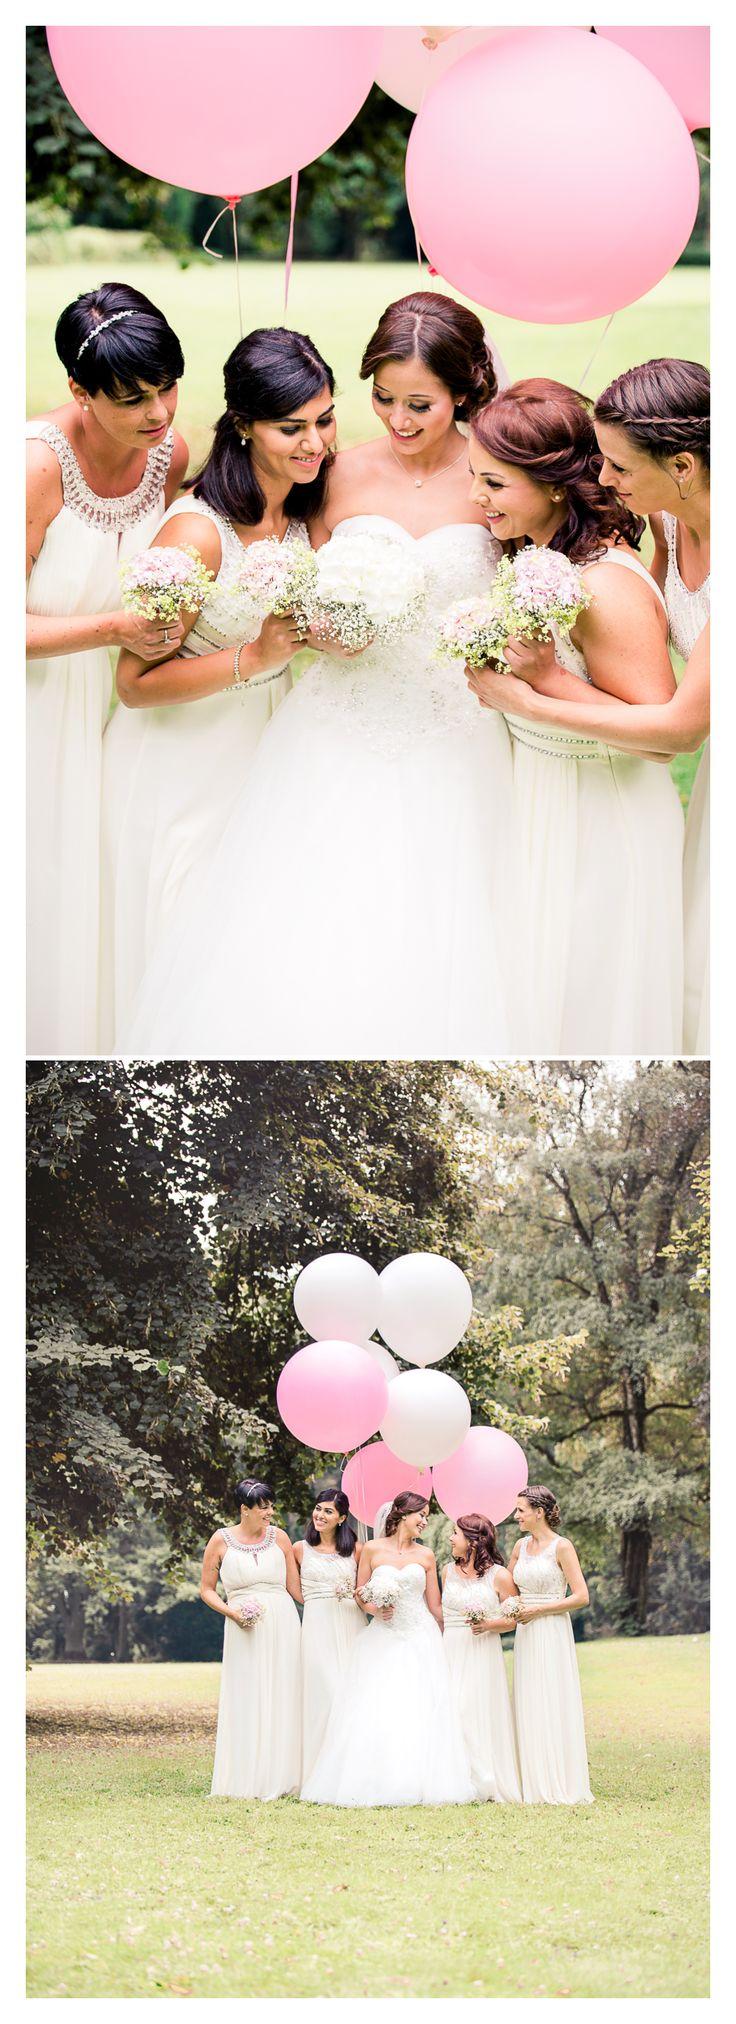 Riesen Ballons | Moderne Hochzeitsfotografie | Hochzeit Ideen | Foto: Miss I DO www.missido.de